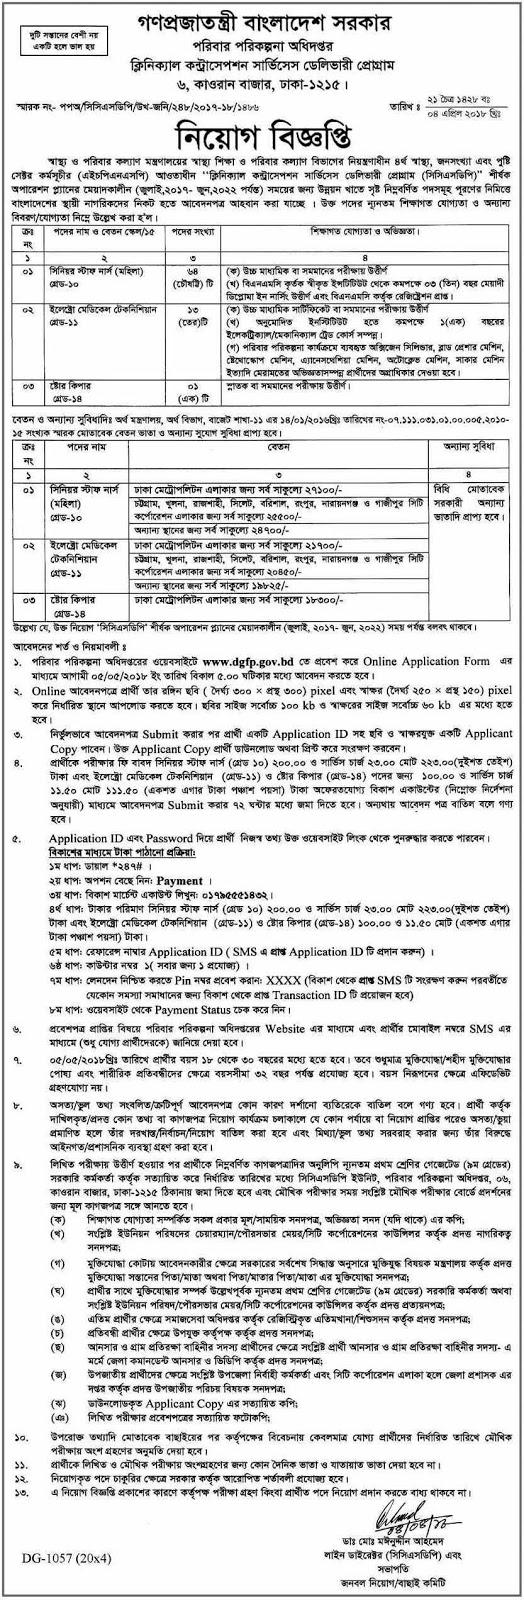 DGFP job circular Exam Result Notice 2018